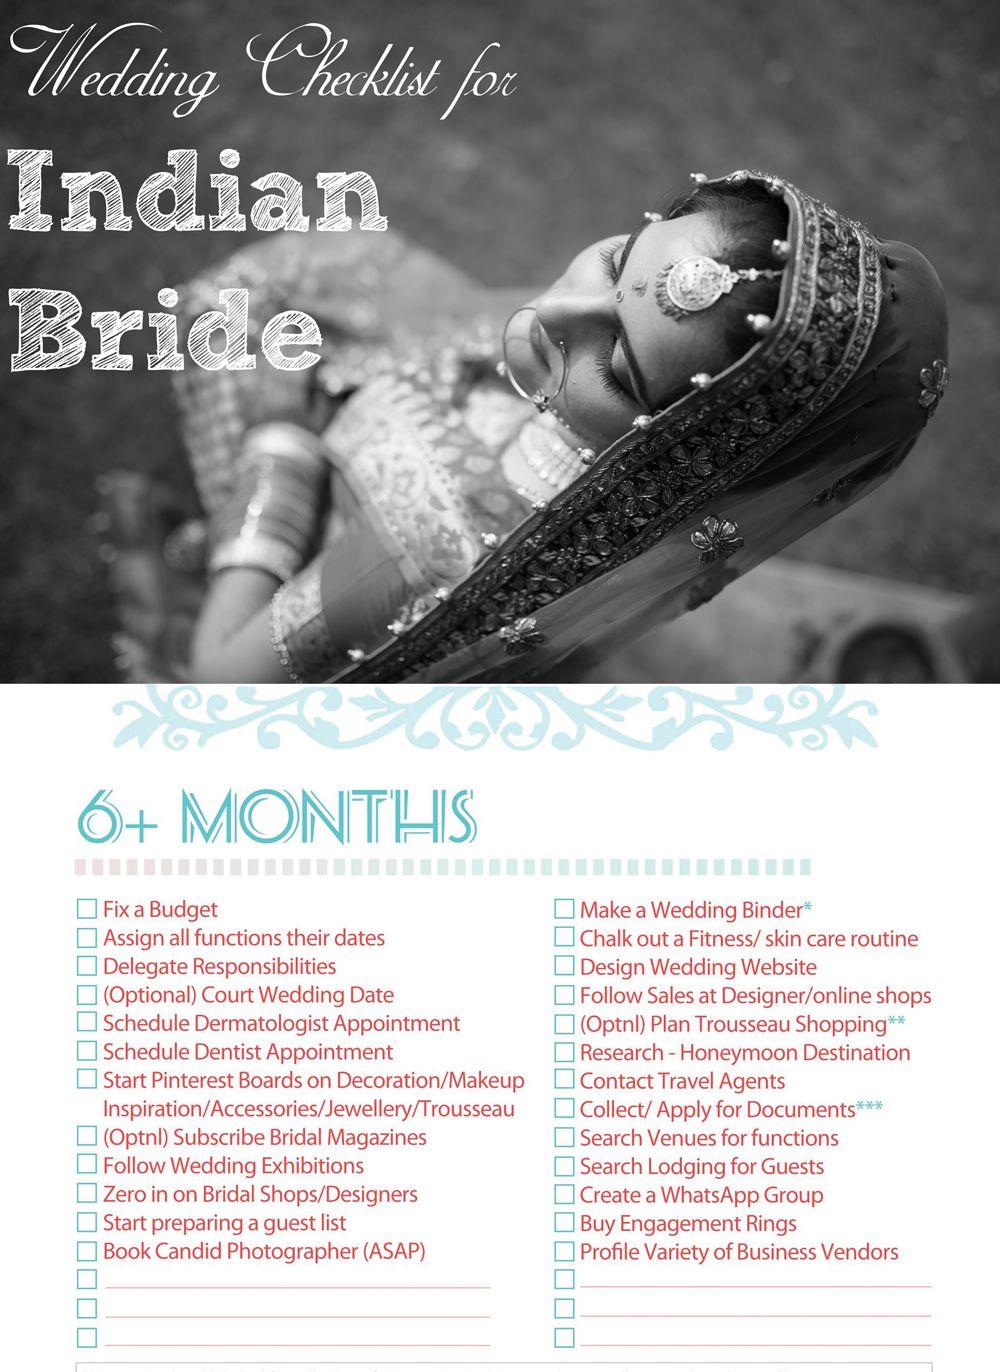 Indian Wedding Checklist for the Bride Indian Bridal Checklist